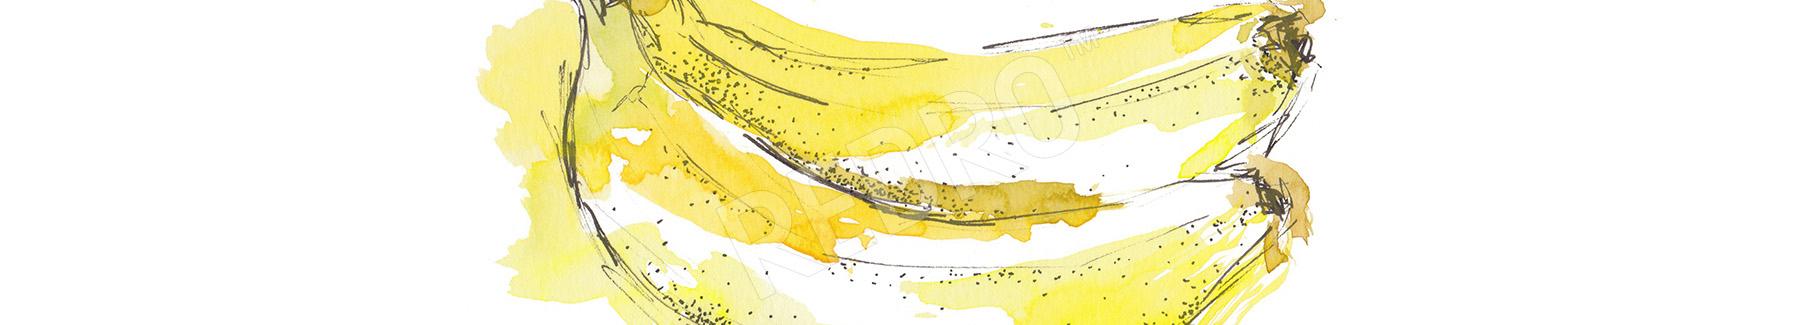 Naklejka banany malowane akwarelą